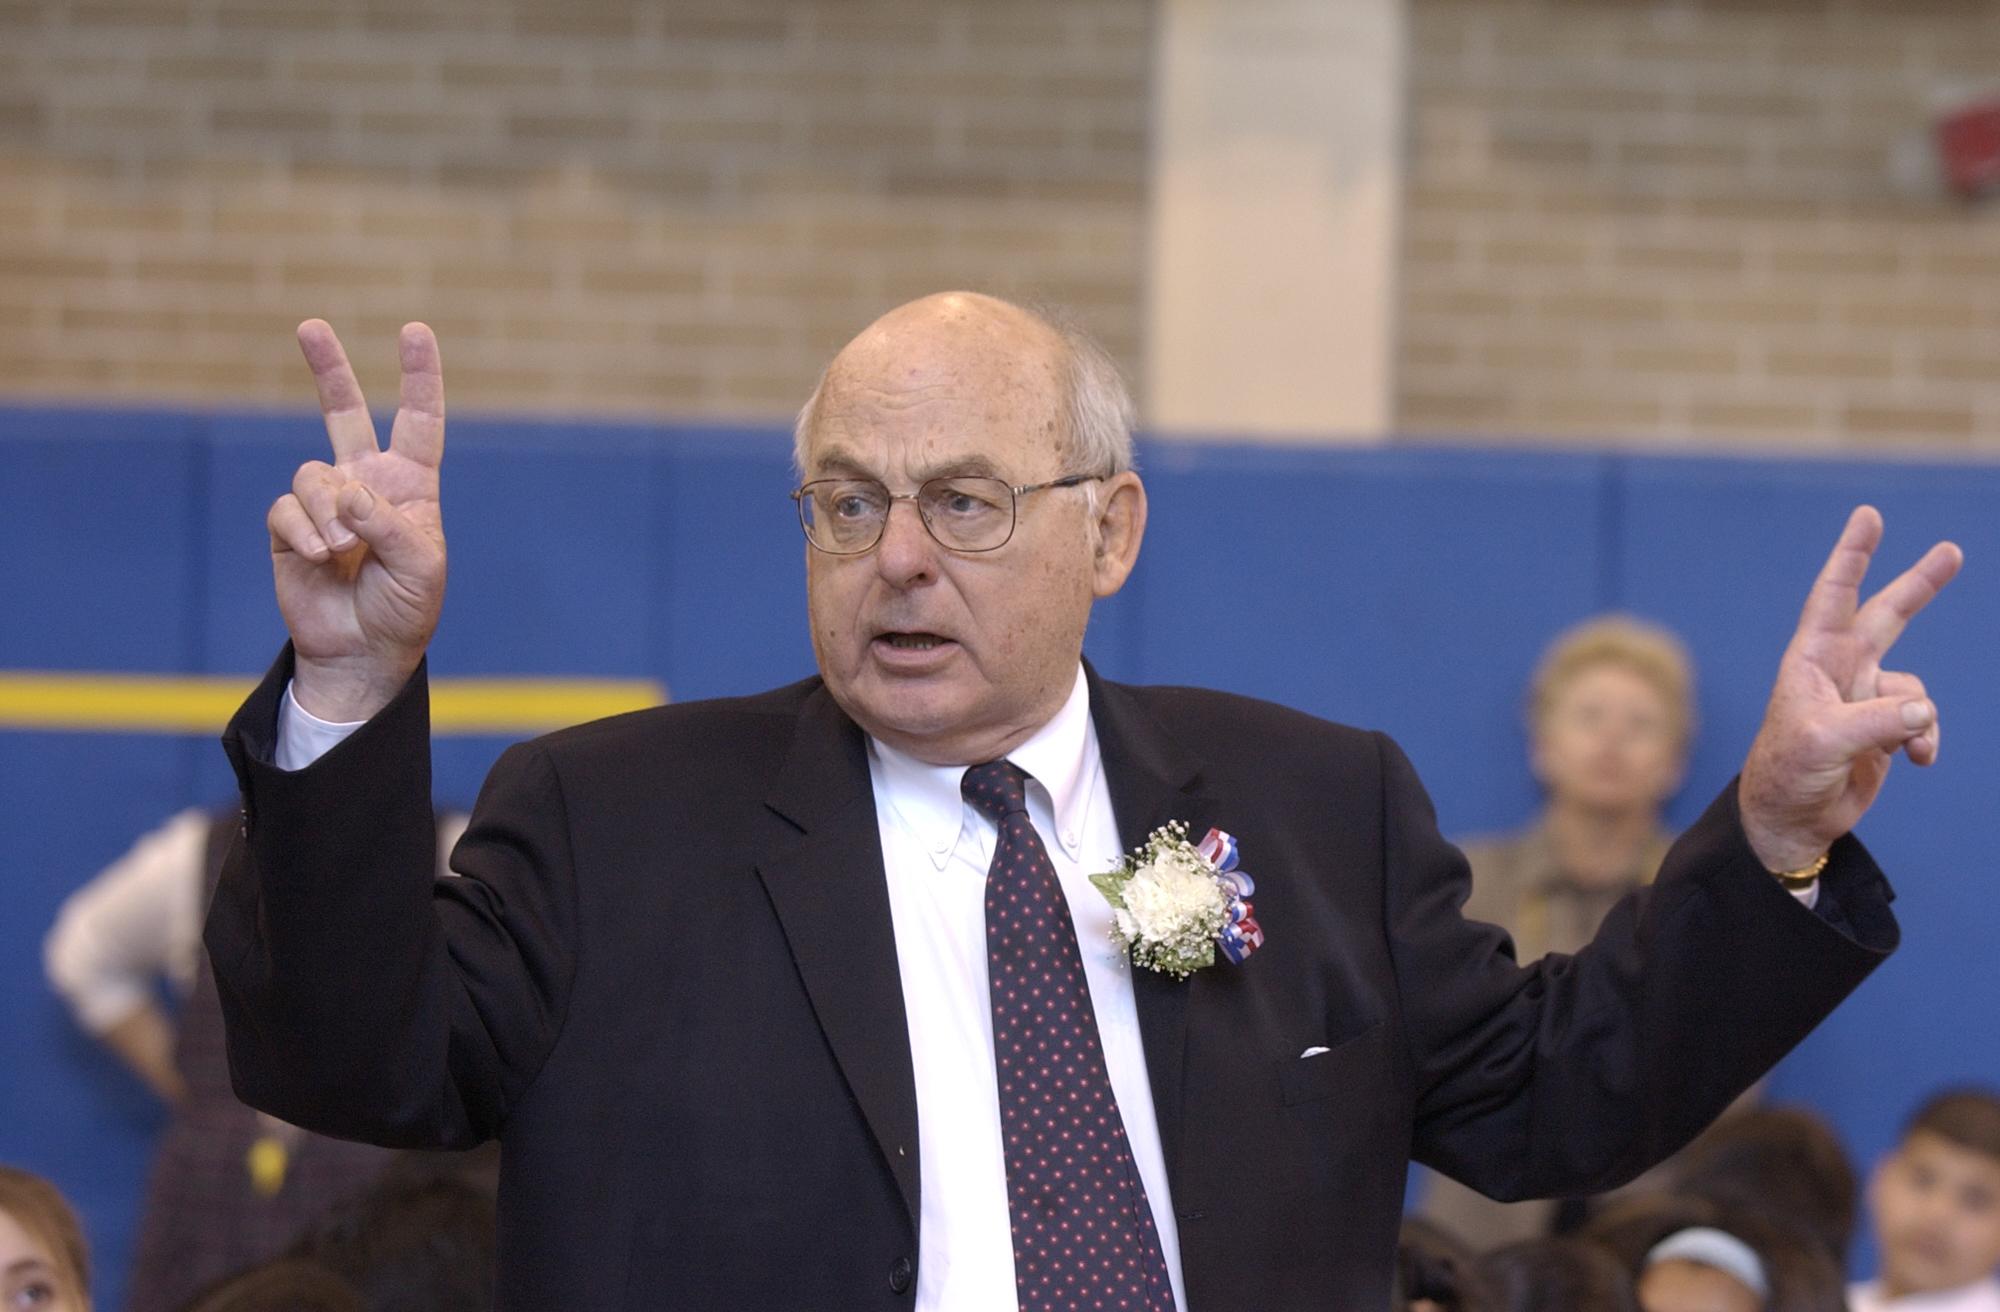 Former Sen. Adlai Stevenson serving as principal for a day at the Adlai Stevenson School on the Southwest Side in 2003.